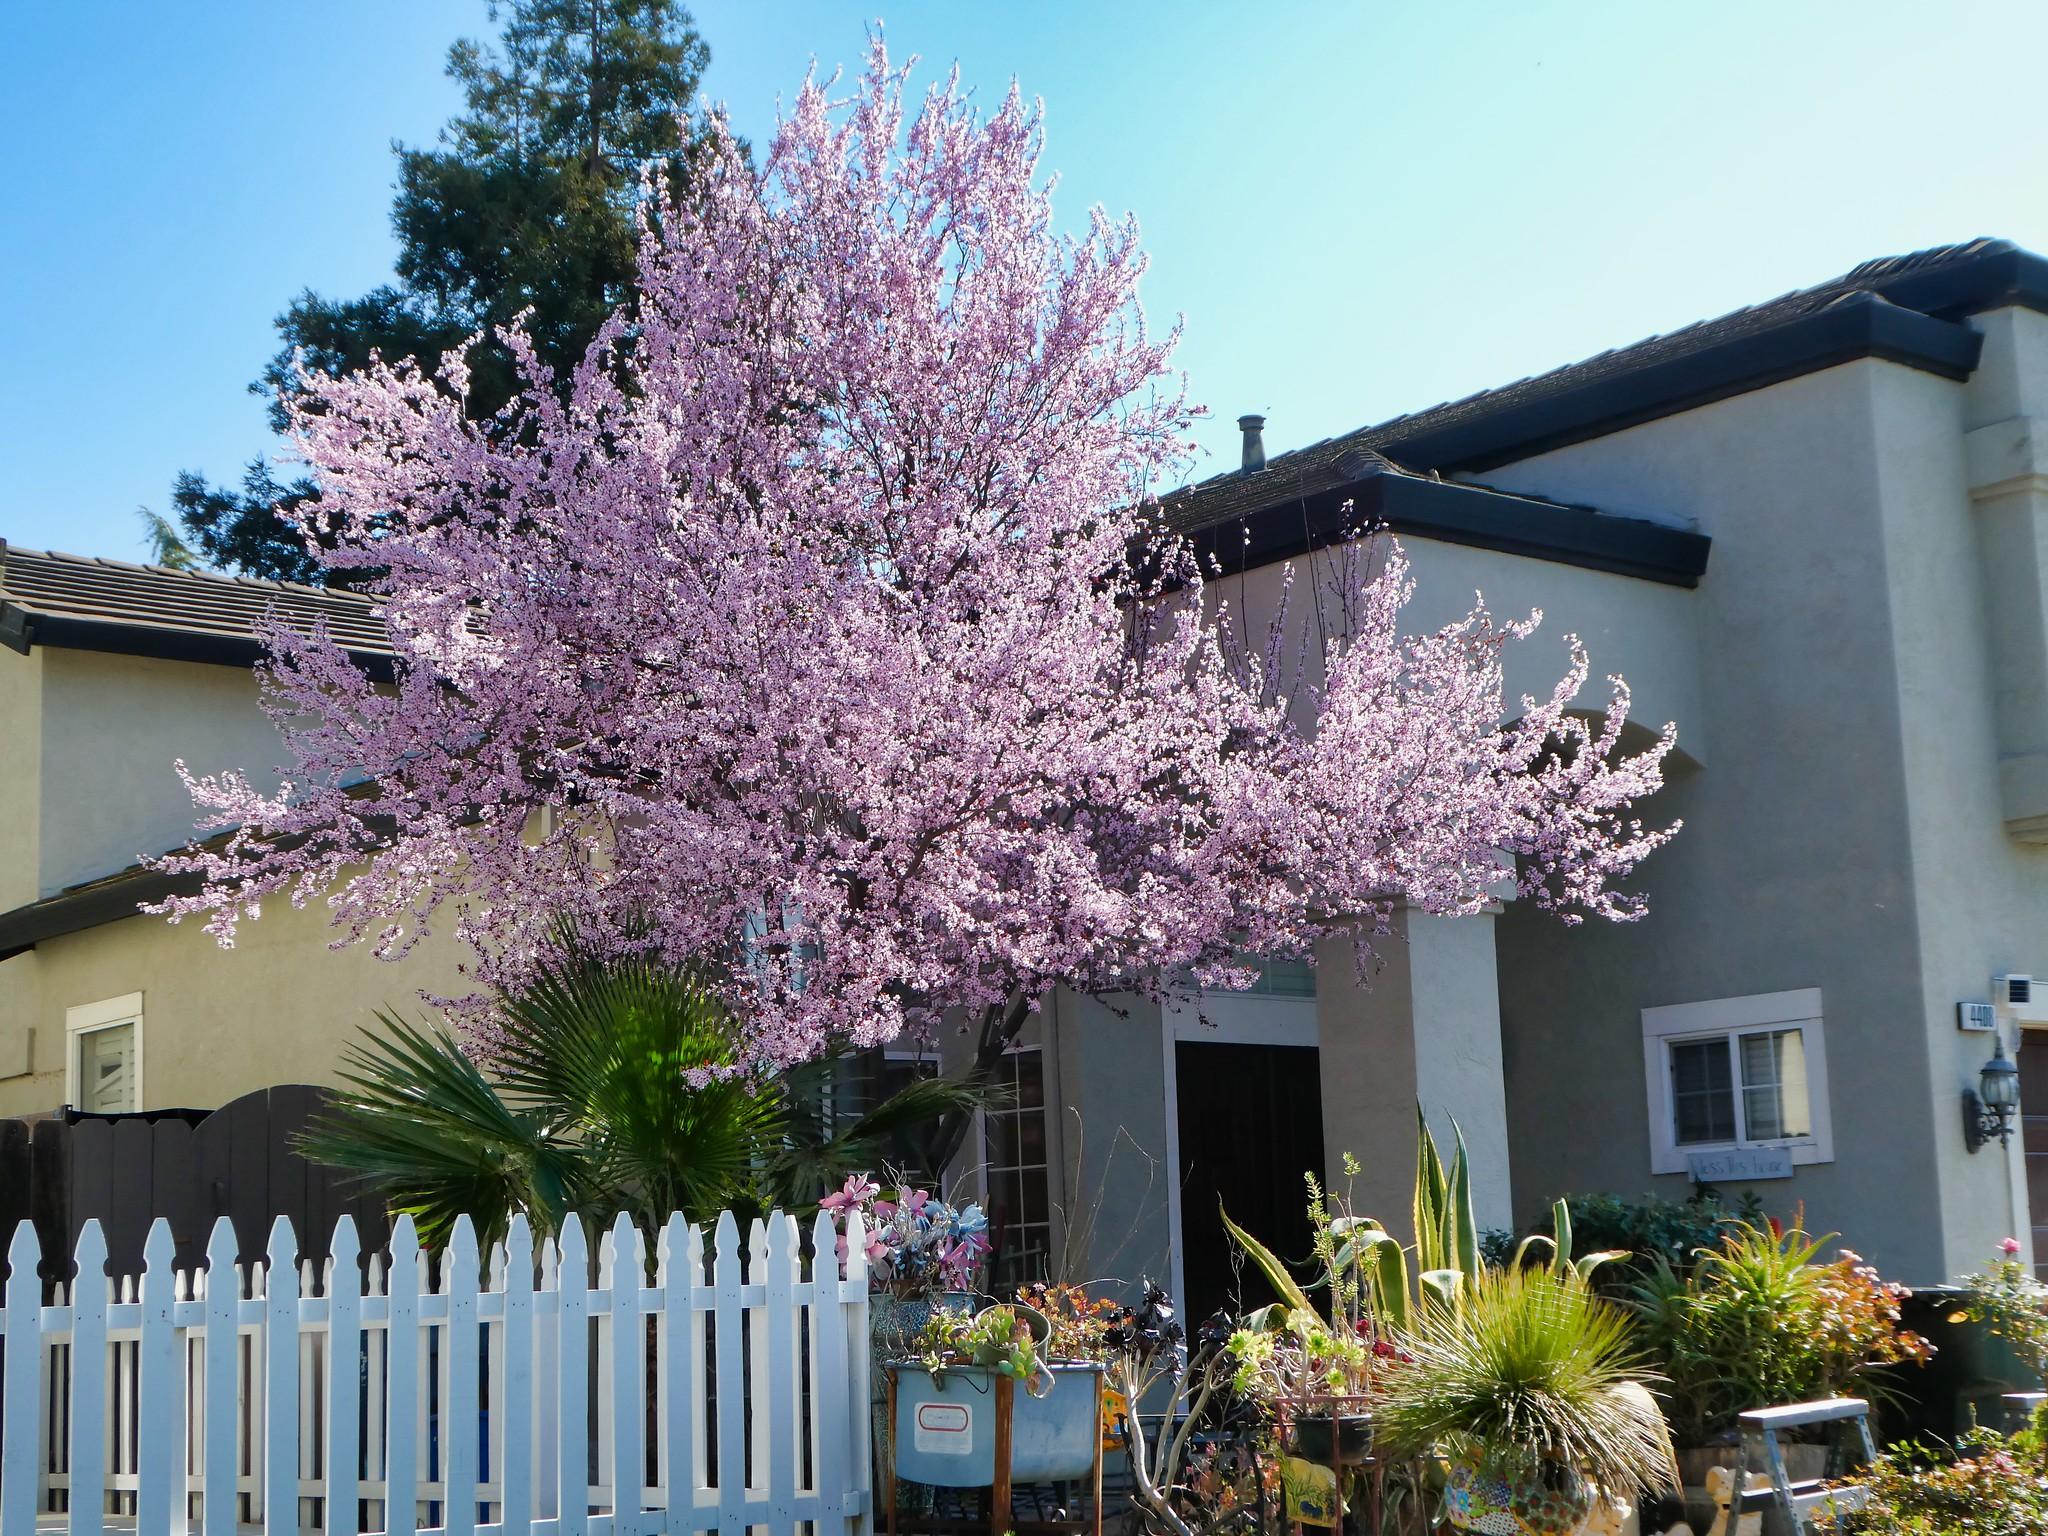 20200226 - Pink Tree in Frontyard (4-5)